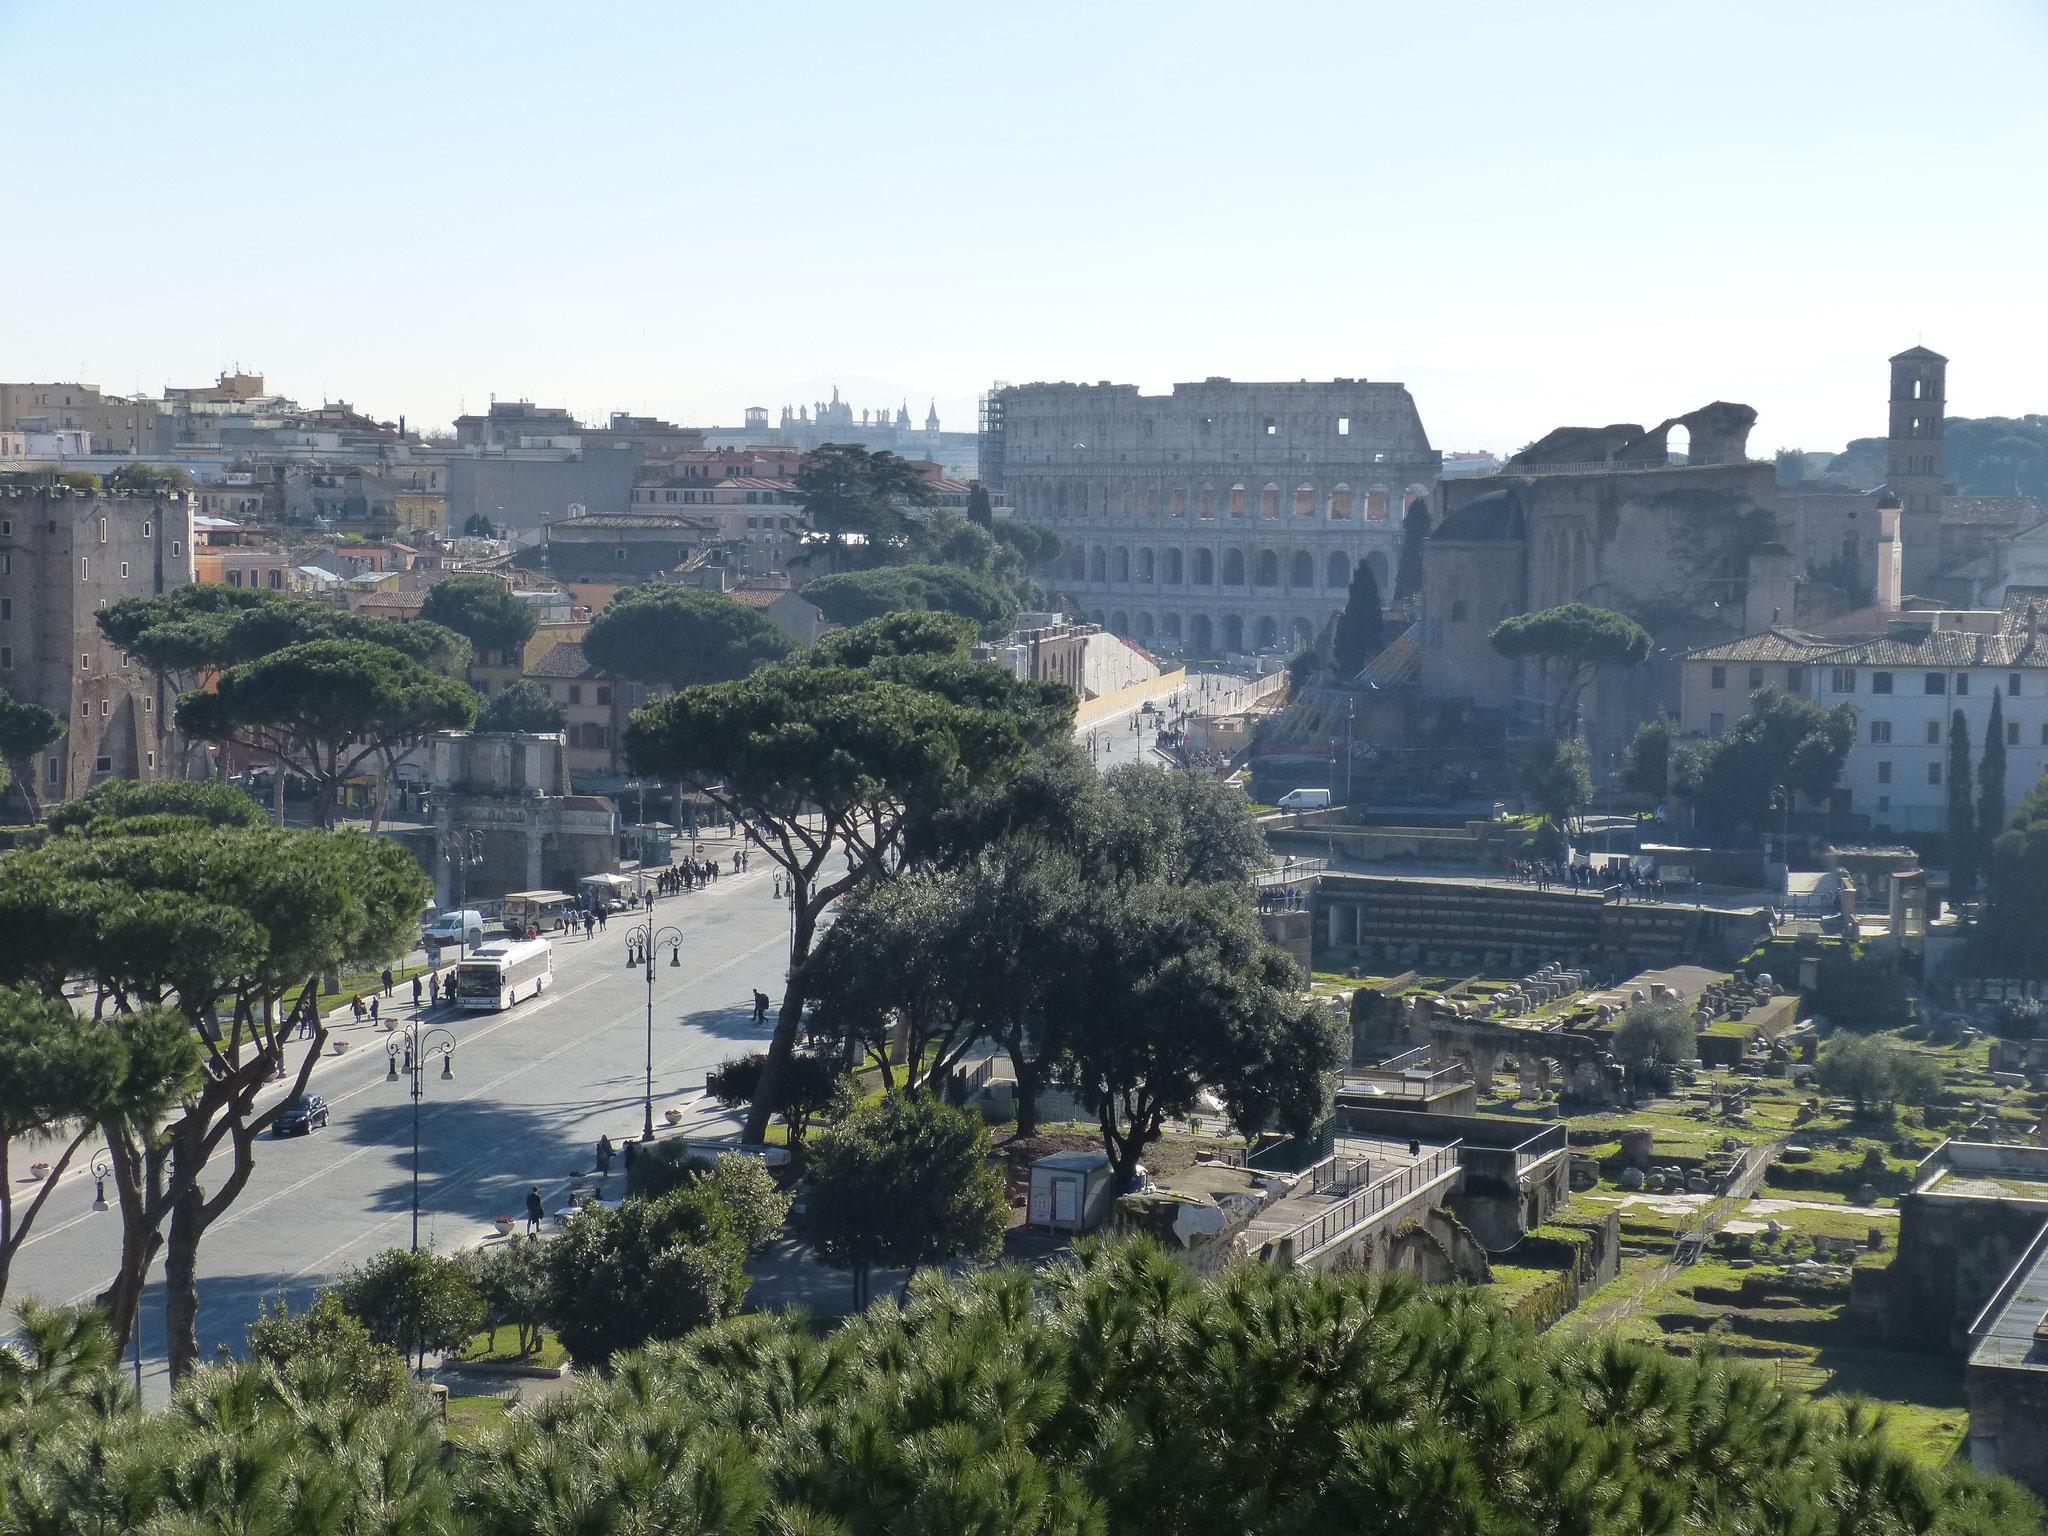 Ausblick auf die Via di Fori Imperiali und das Kolosseum